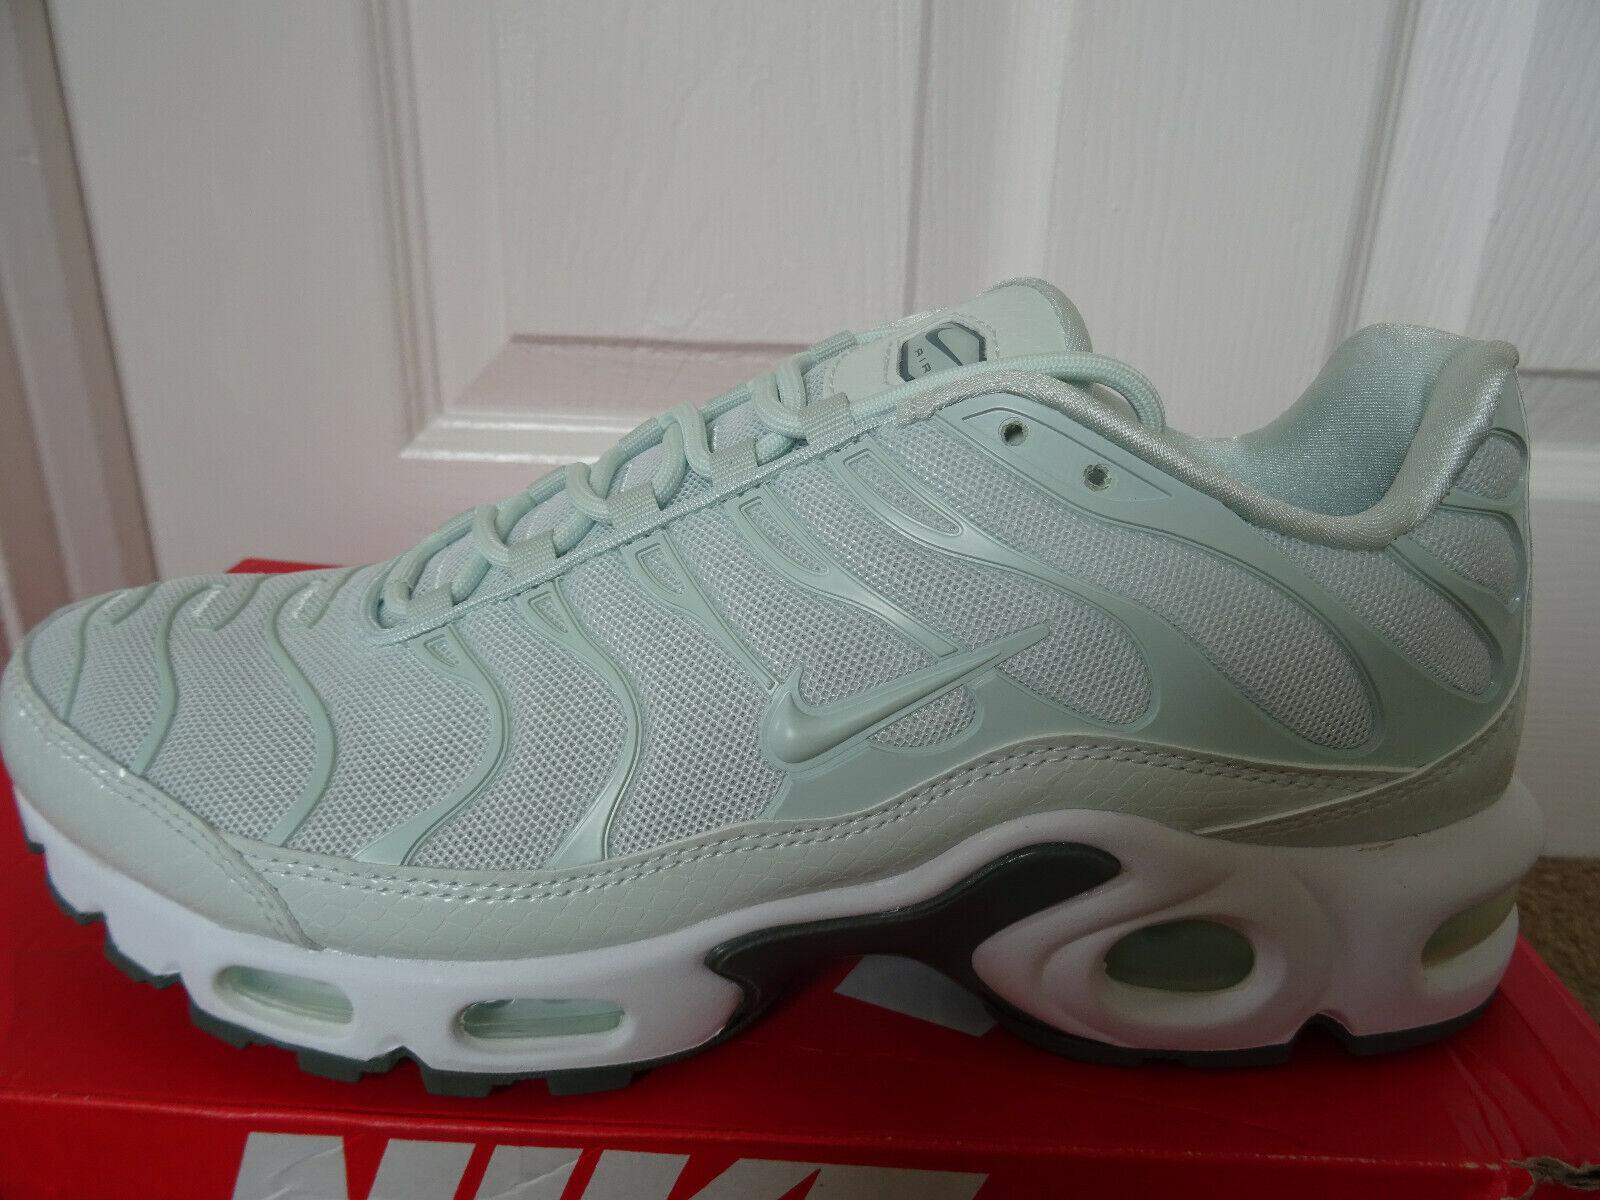 Nike Air max plus SE wmns trainers Turnschuhe 862201 005 uk 7 eu 41 us 9.5 NEW+BOX